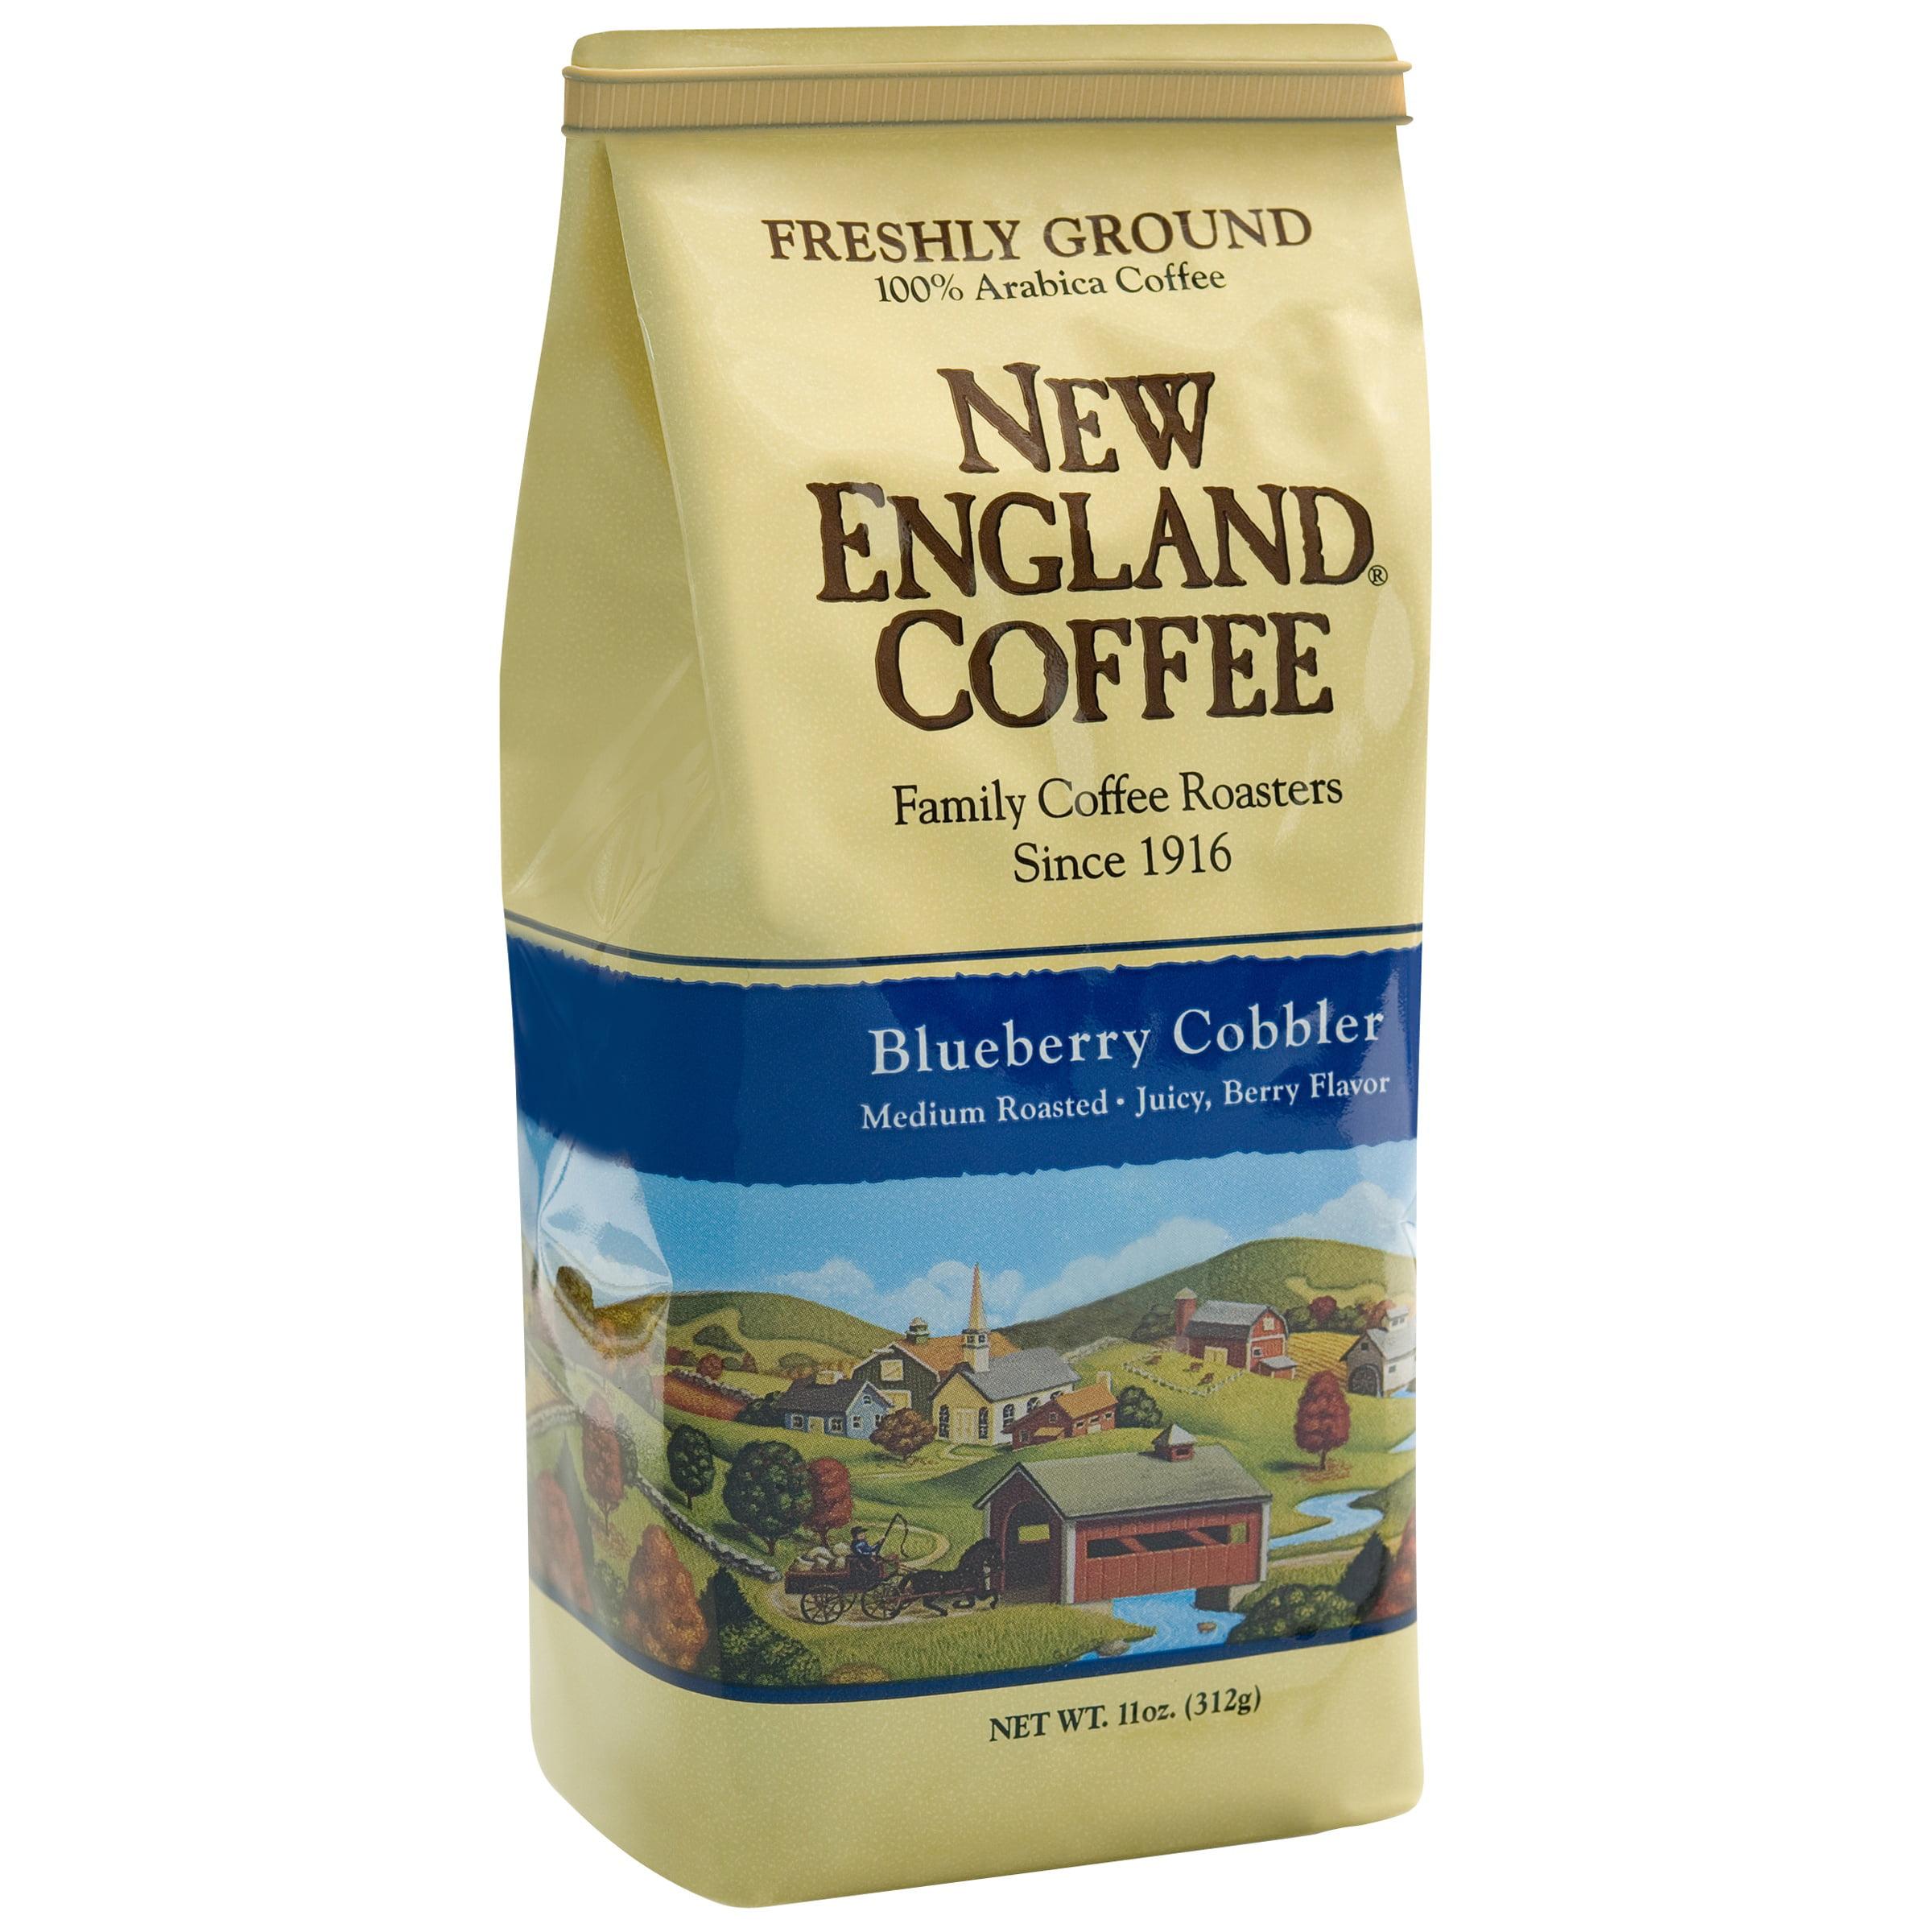 New England Coffee Blueberry Cobbler Ground Coffee, 11 oz